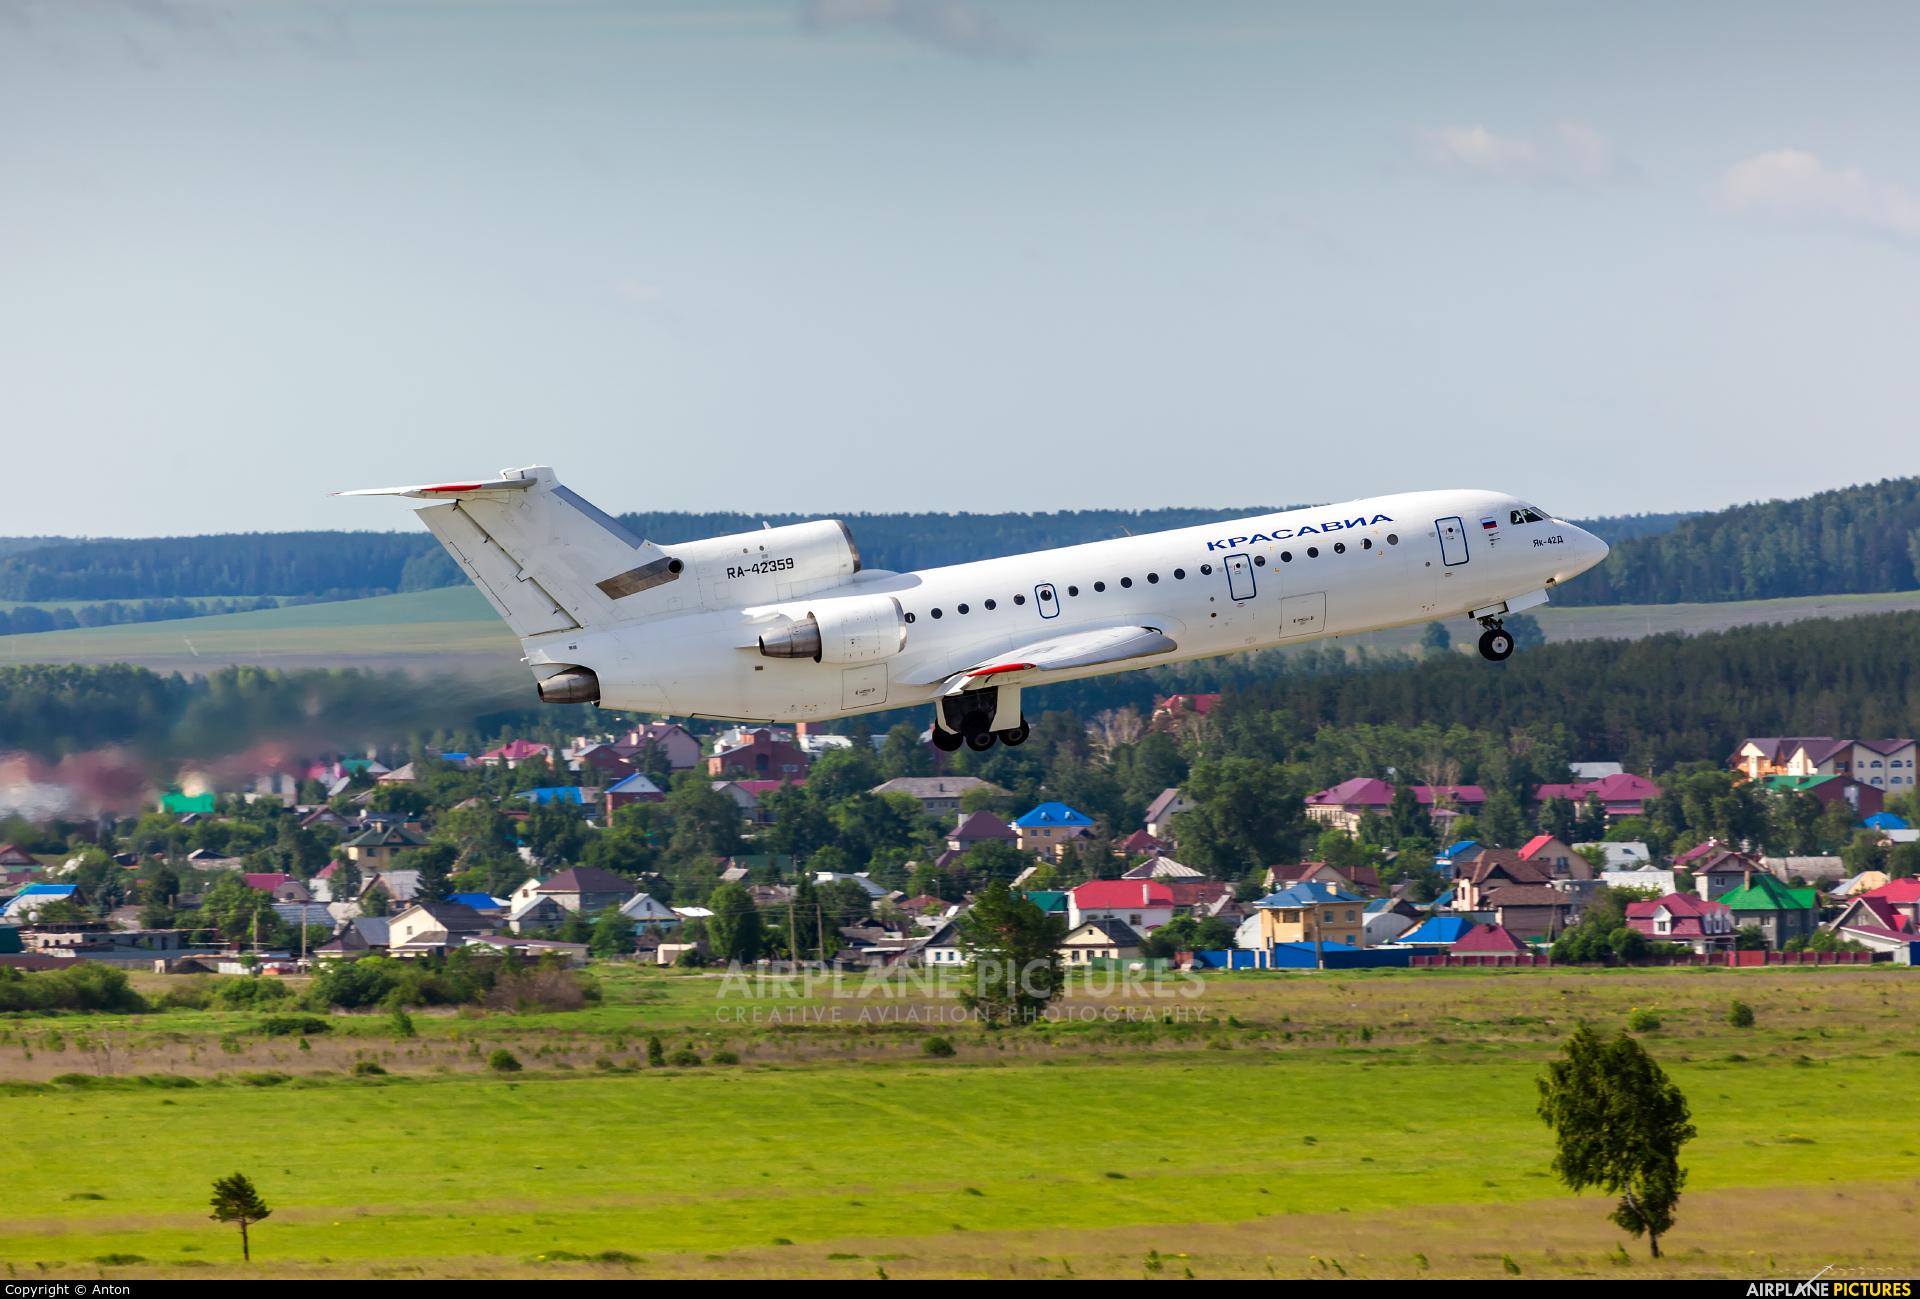 KrasAvia RA-42359 aircraft at Koltsovo - Ekaterinburg